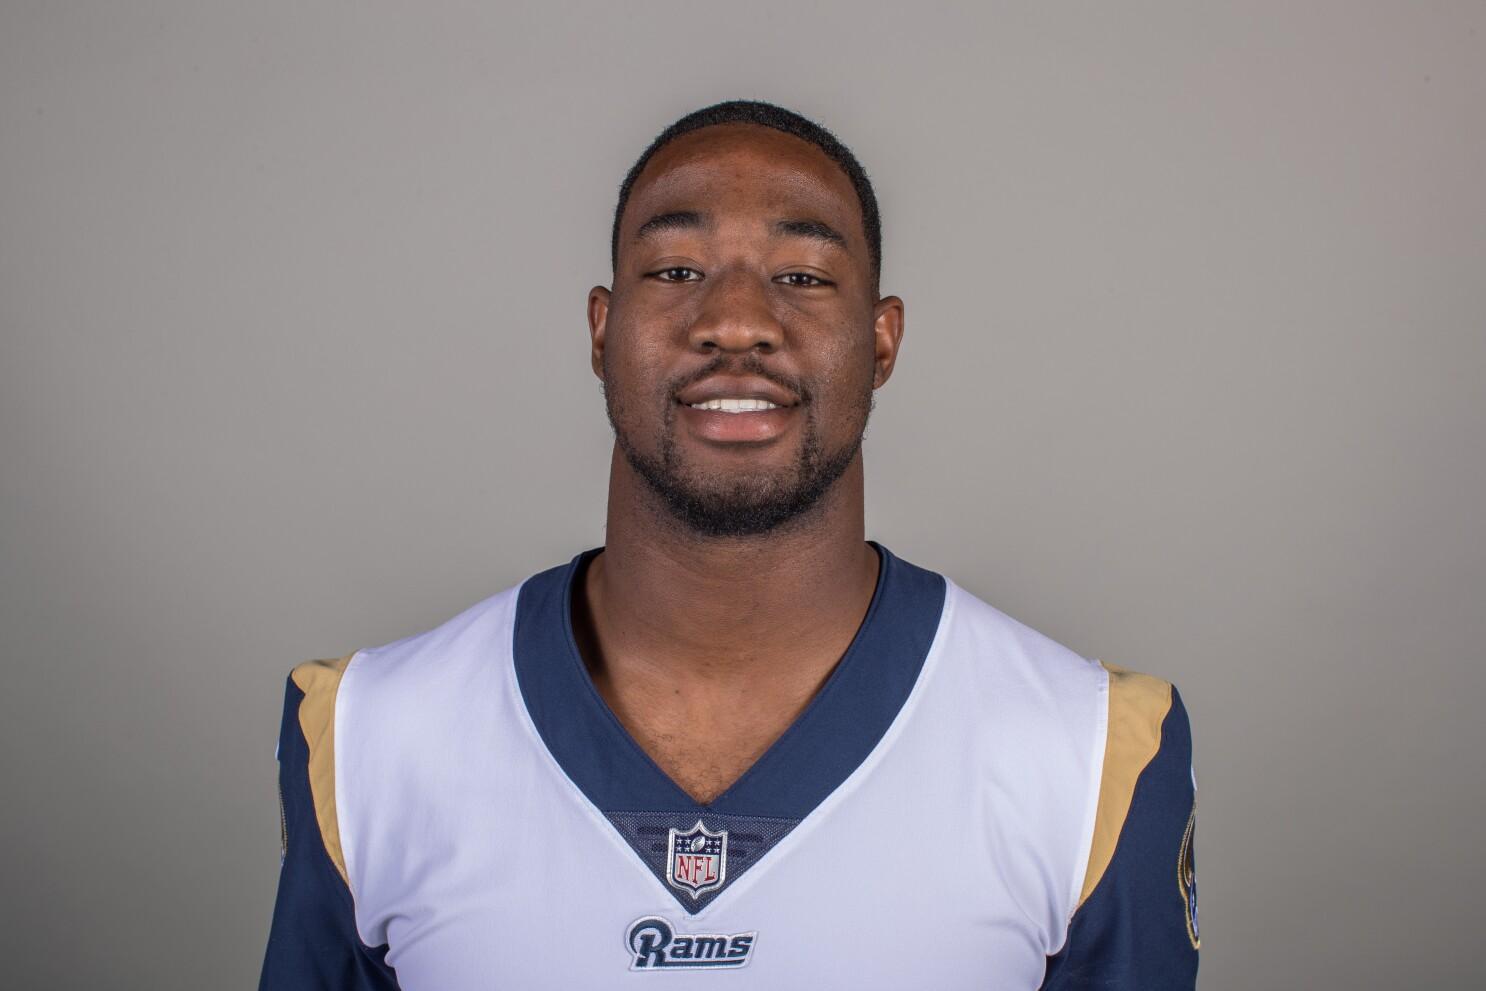 Ogbonnia Okoronkwo hopes to make Rams' linebackers crew